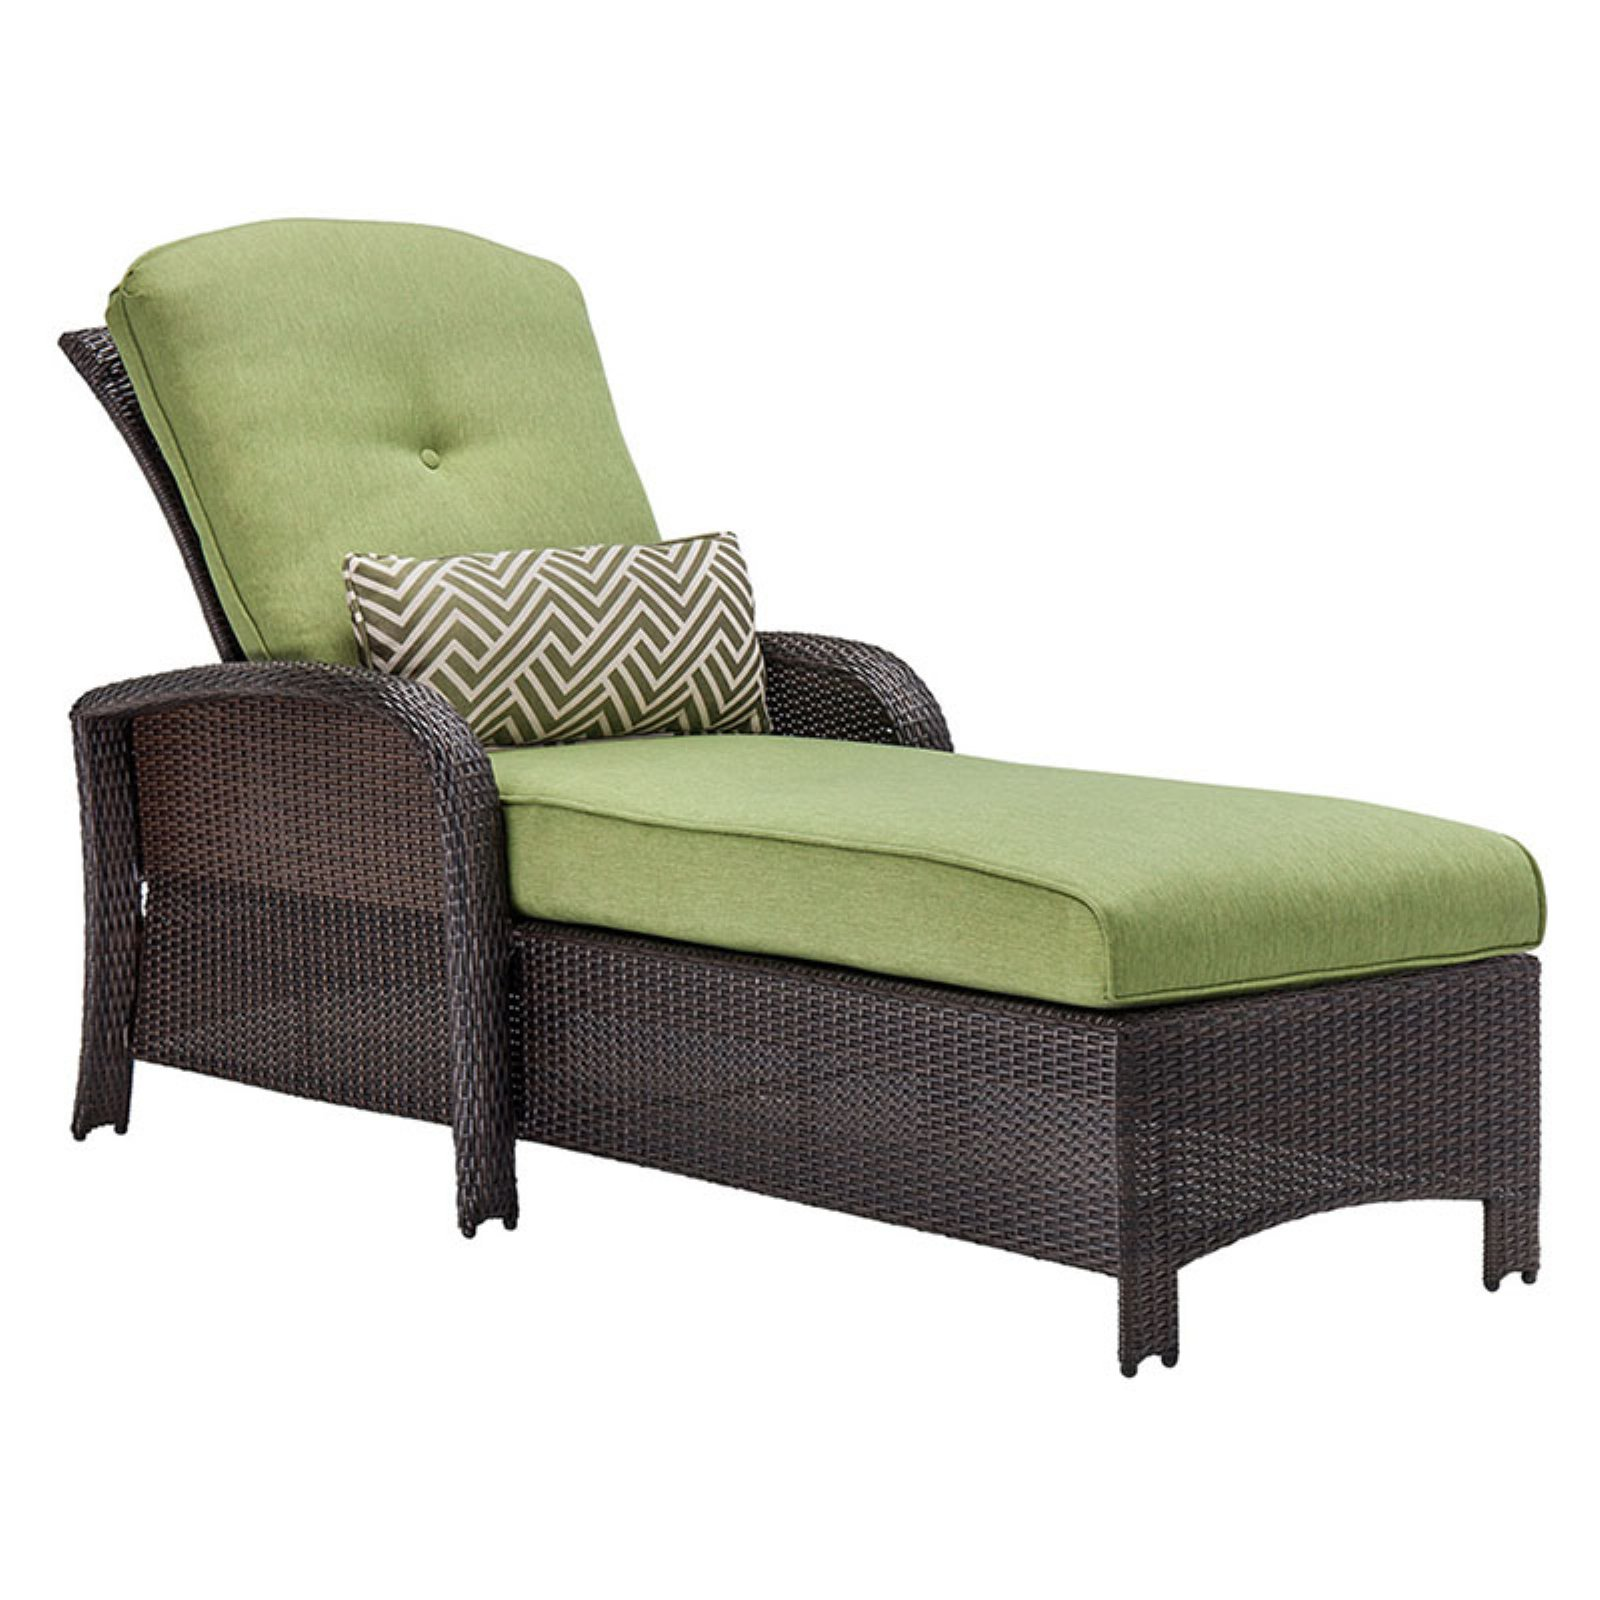 Hanover Strathmere Outdoor Luxury Wicker Chaise Lounge Cilantro Green STRATHCHS